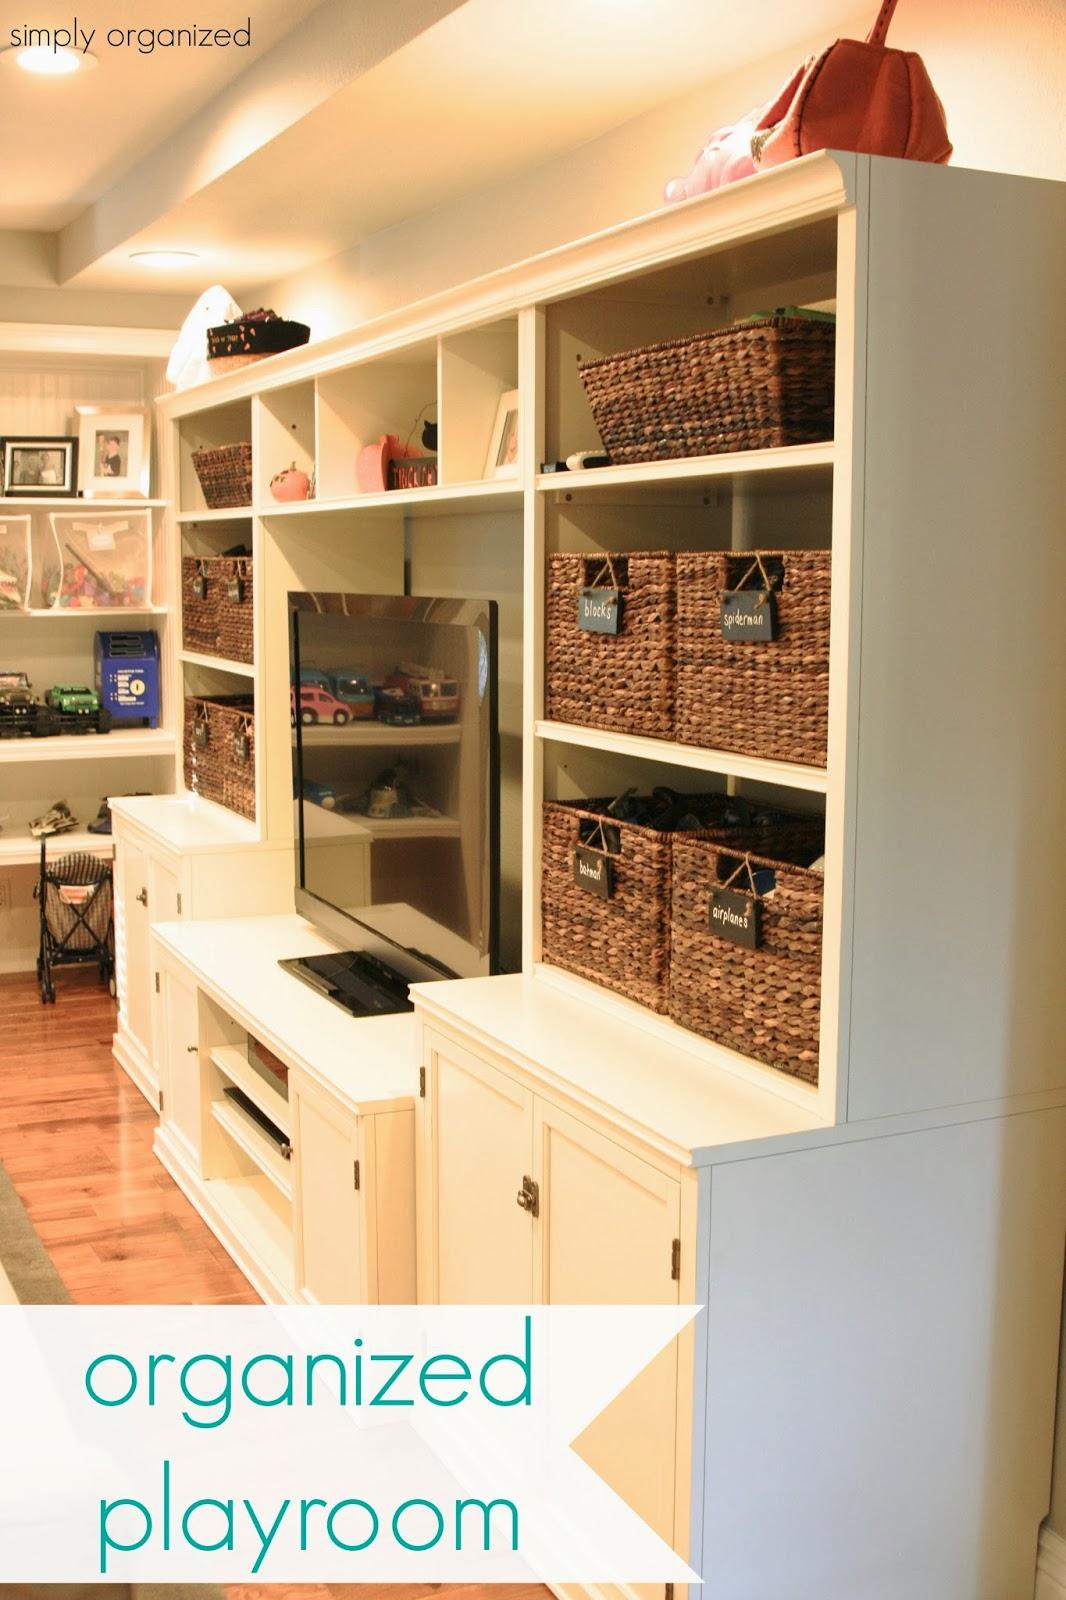 Operation Organization 2017 Playroom From Simply Organized